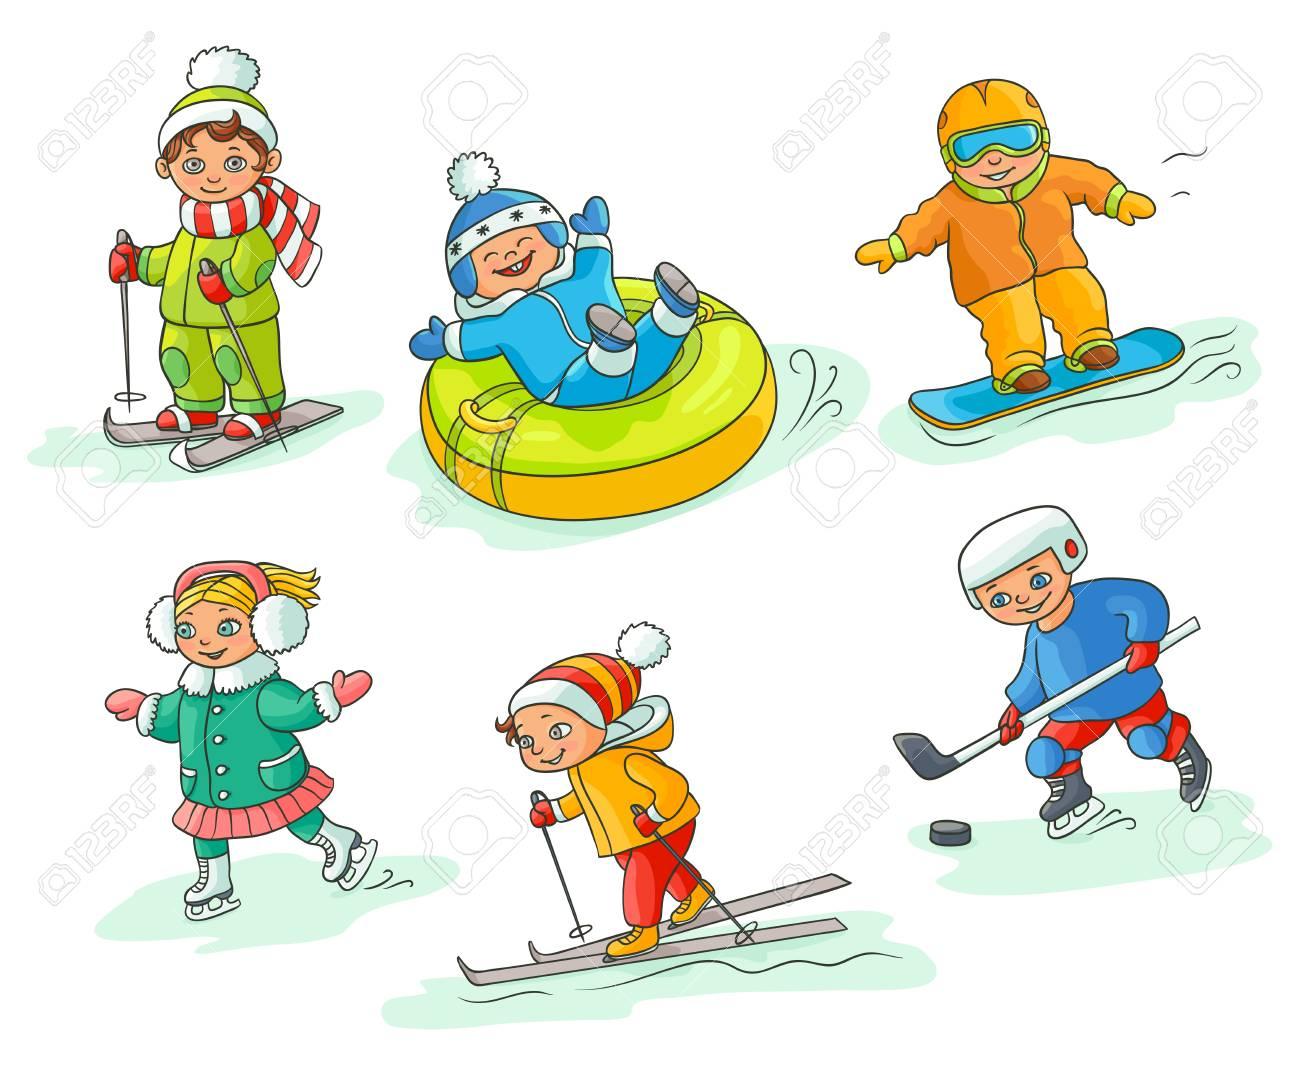 Kids Having Fun In Winter Skiing Snowboarding Ice Skating Royalty Free Cliparts Vectors And Stock Illustration Image 88369431